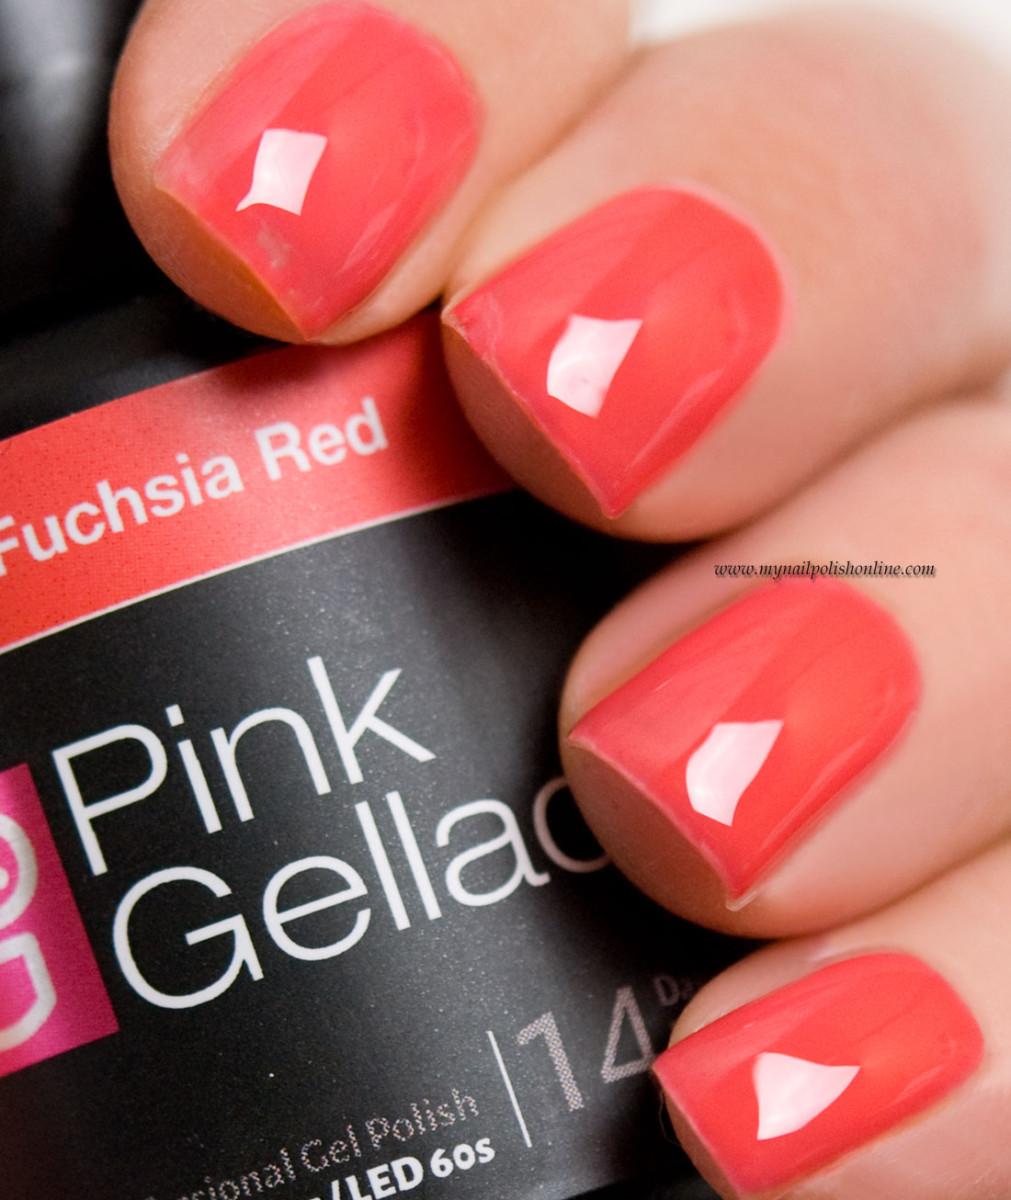 Pink Gellac Fuchsia Red